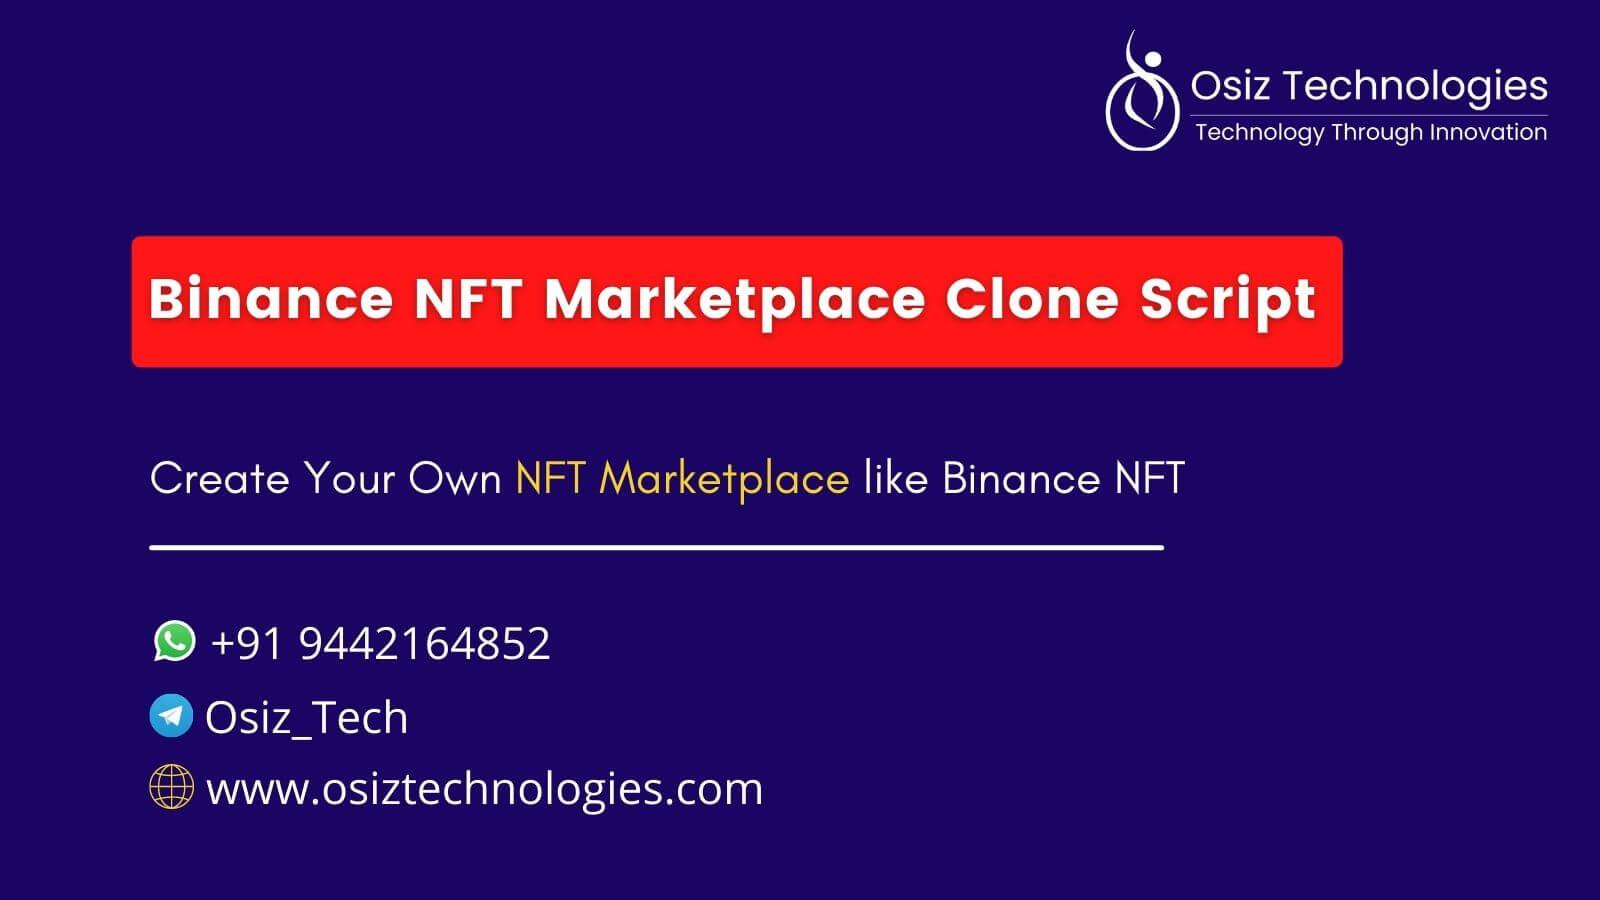 Binance NFT Marketplace Clone Script - To Launch an NFT Marketplace Like Binance NFT